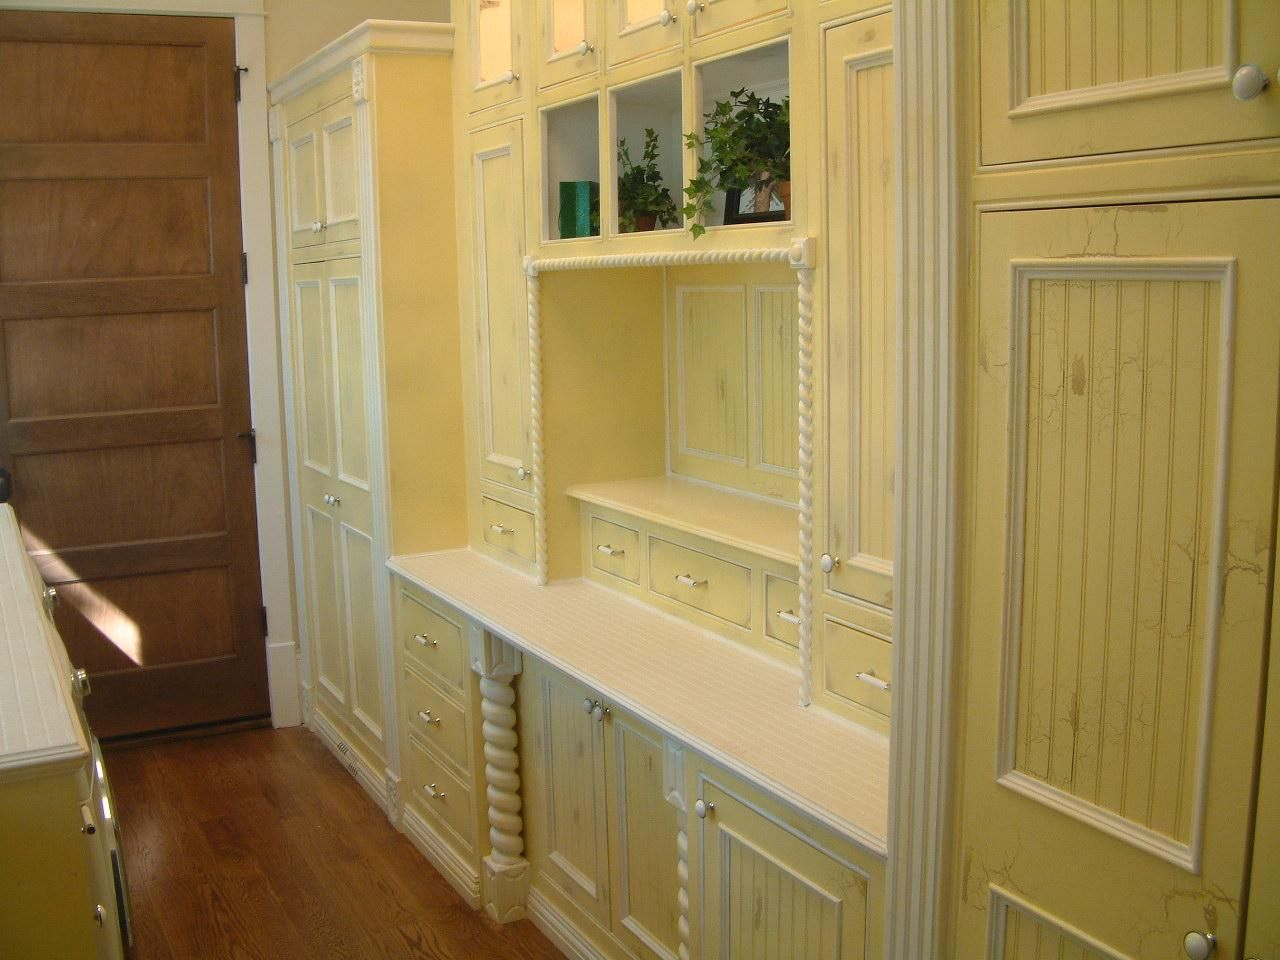 Distressed Cabinets Kitchen Cabinet Door Styles White Kitchen Cabinet Doors Distressed Cabinets